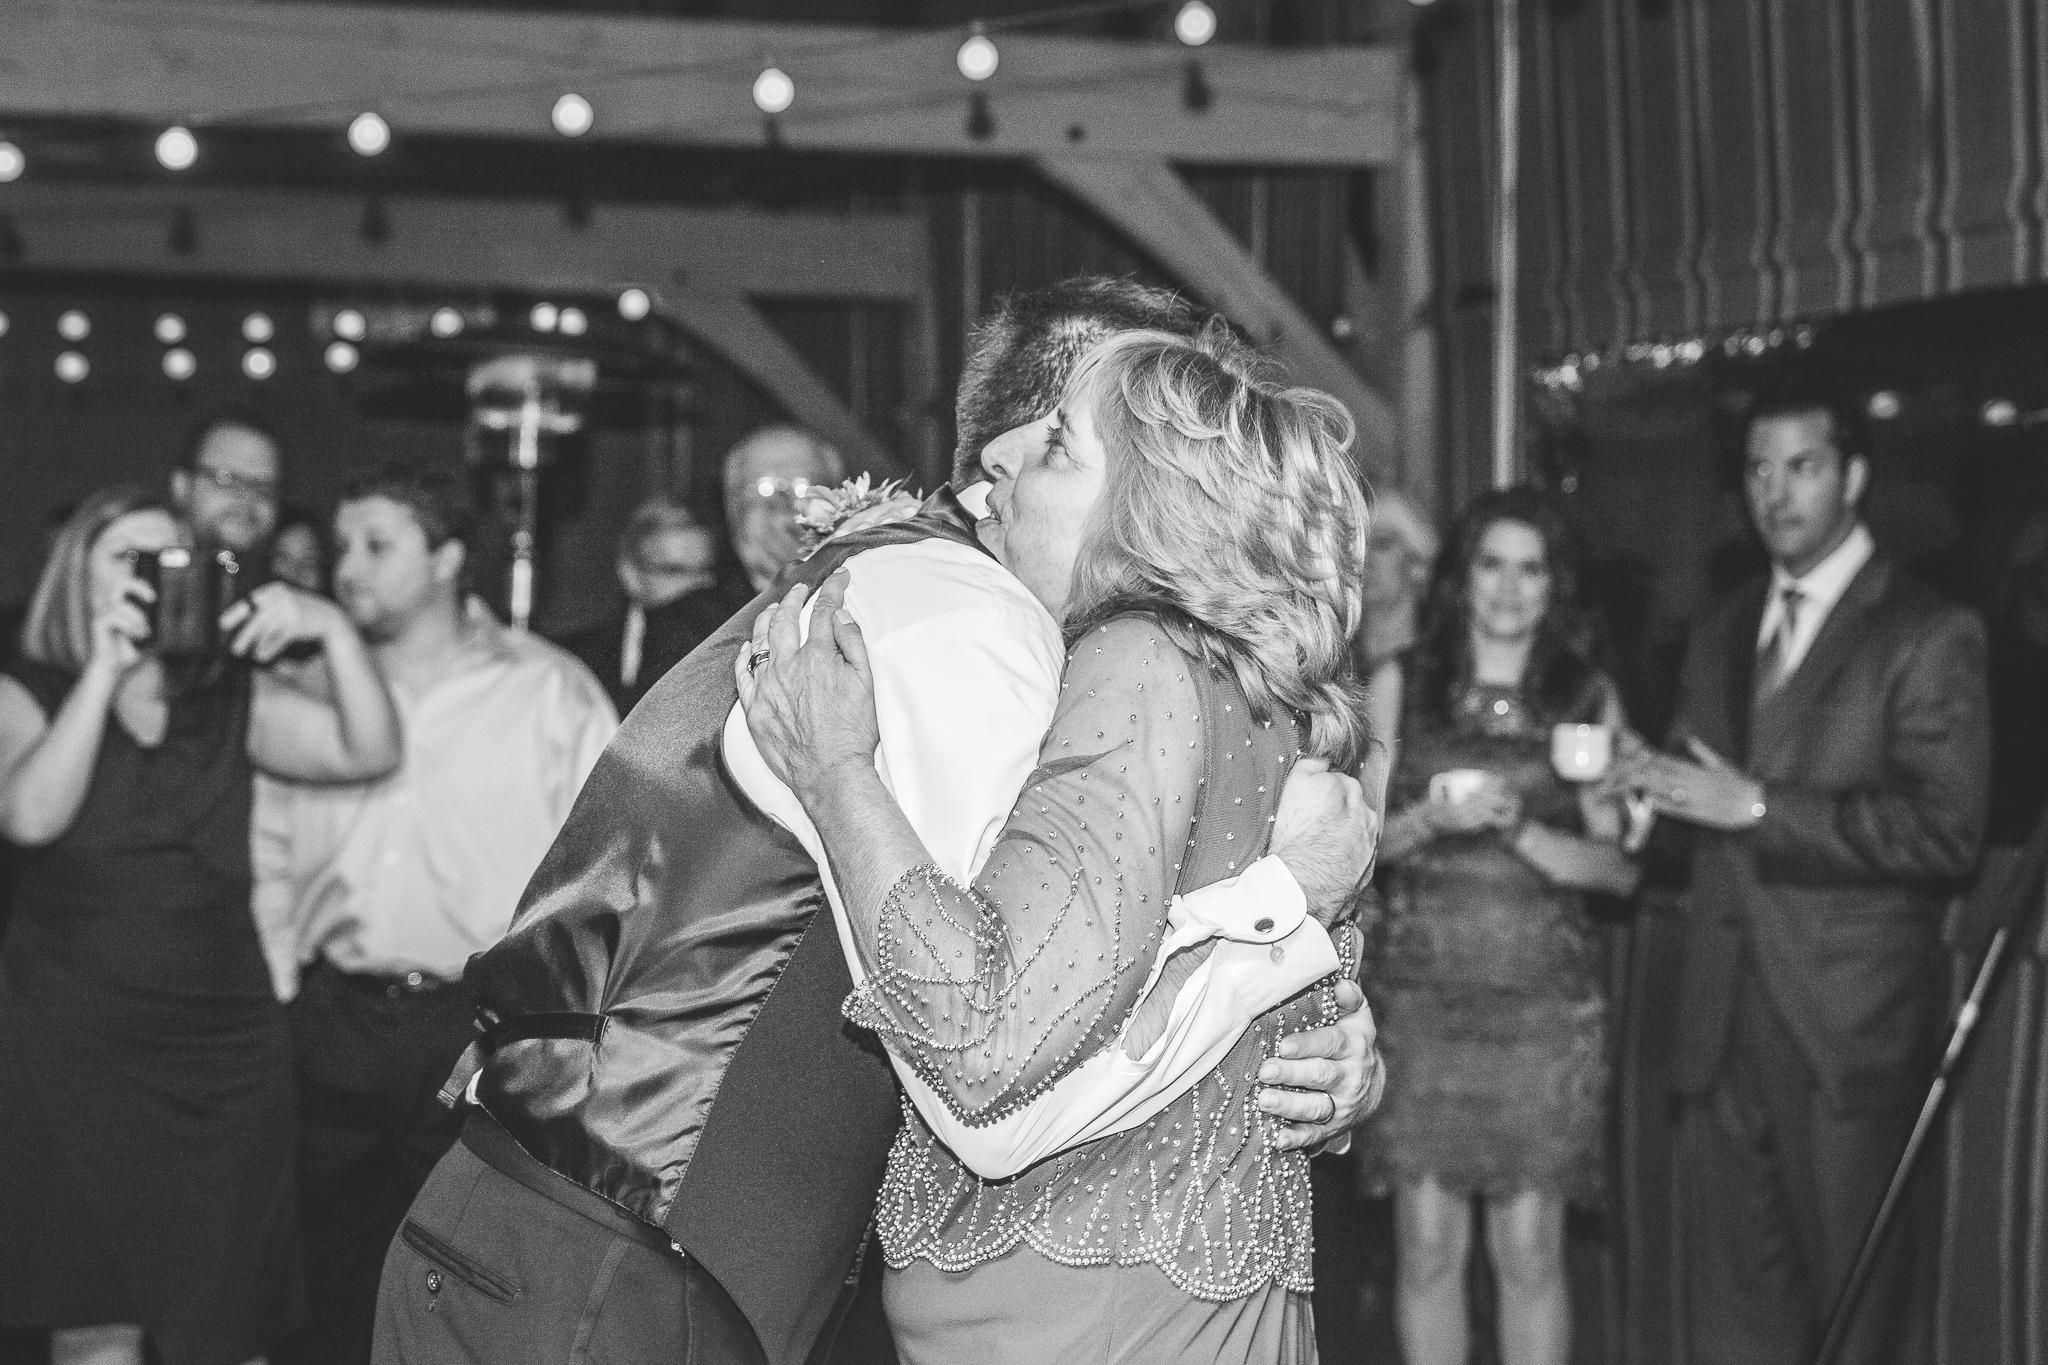 camuglia-whomstudio-chelsea_and_andy-nycphotographer-wedding-brooklyn-buffalo-timberlodge-130-0802.jpg